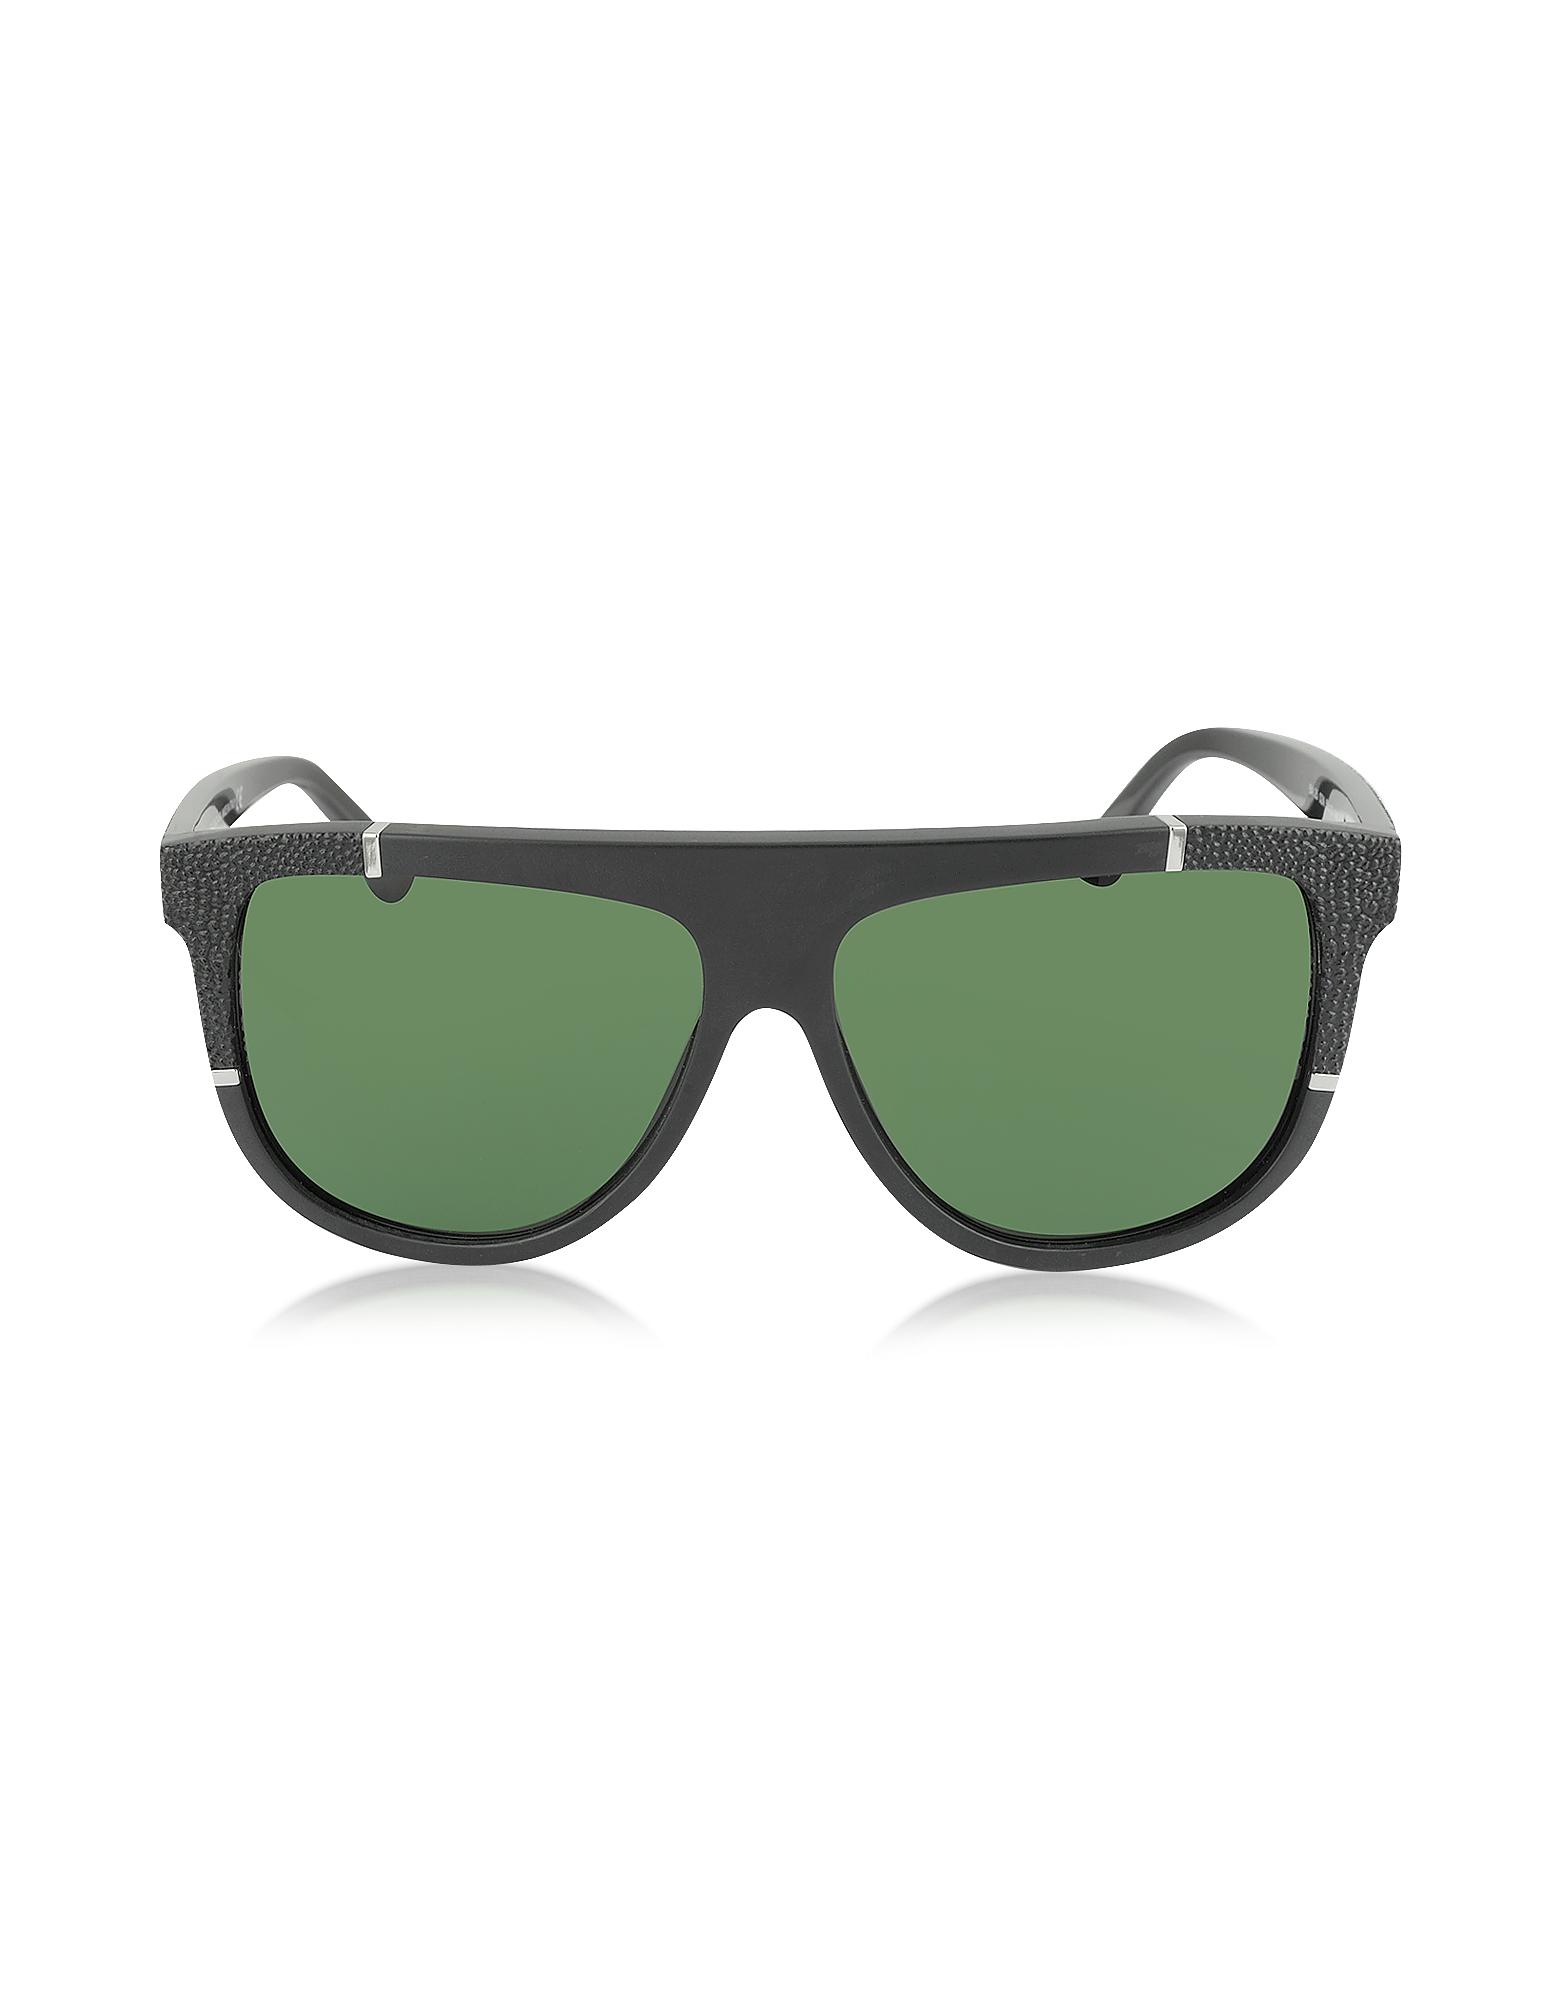 Balenciaga Sunglasses, BA0025 Acetate Shield Women's Sunglasses w/Rubber Details